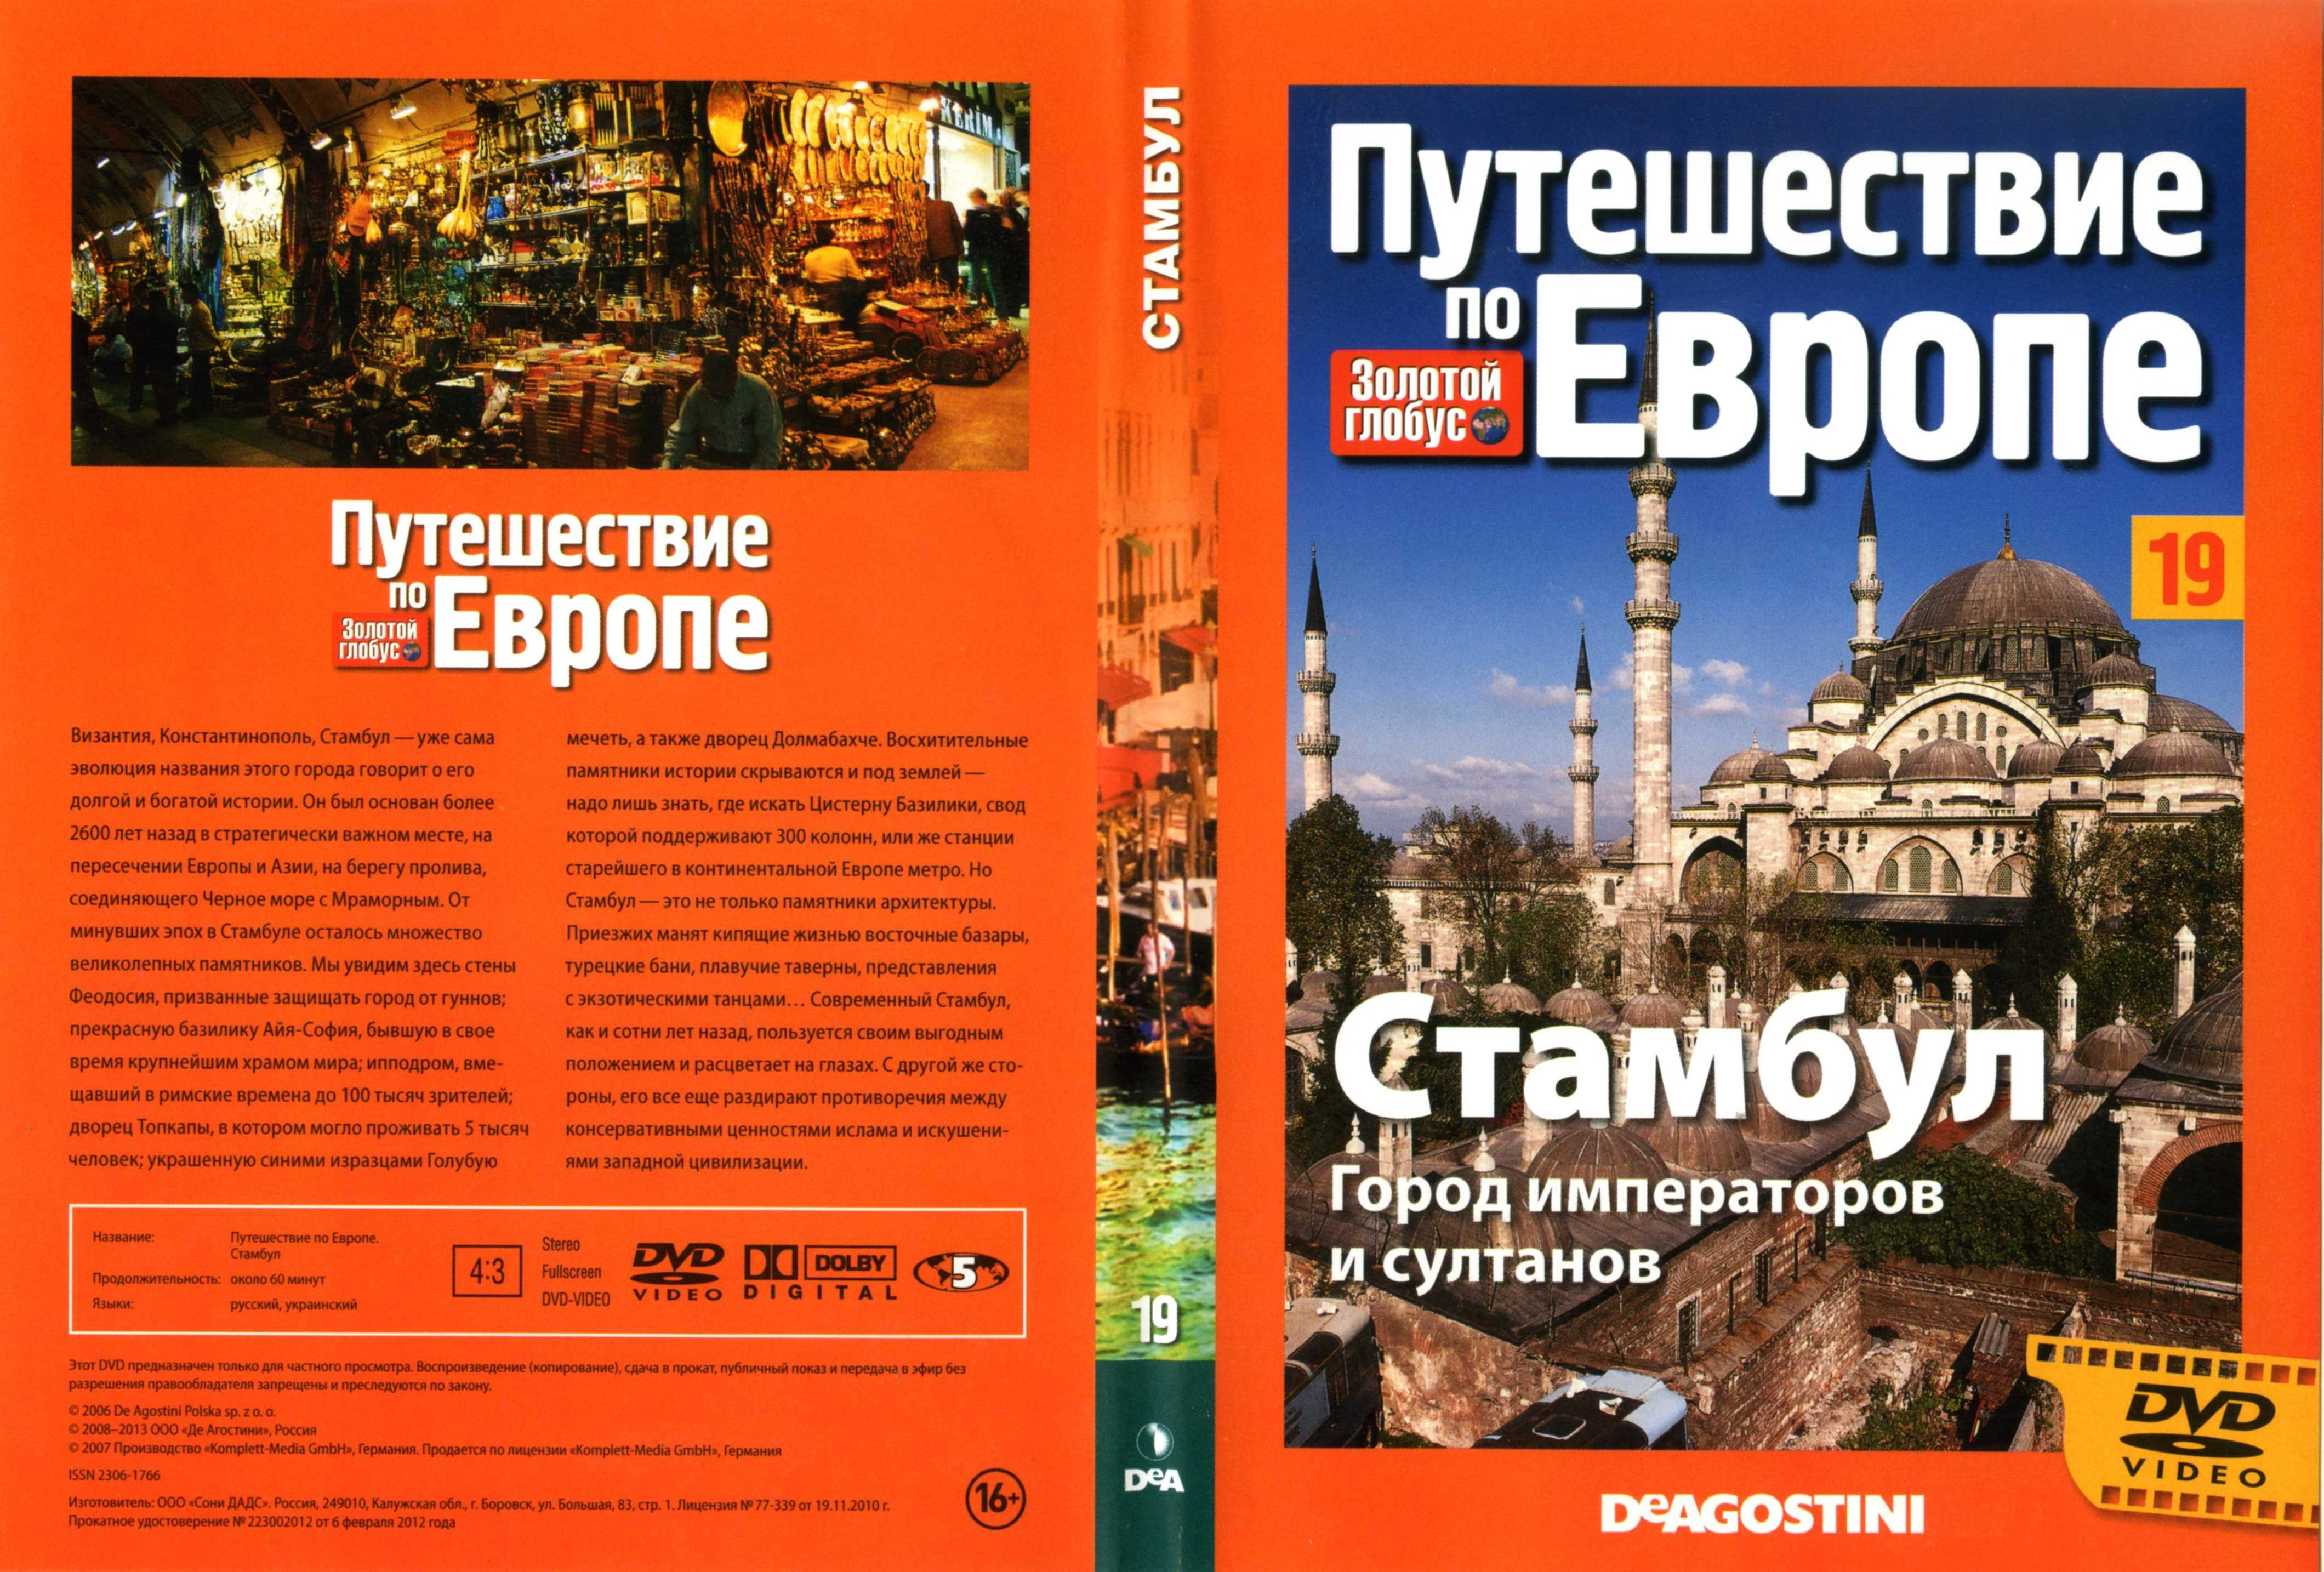 http://i6.imageban.ru/out/2013/06/09/d035f7098ef408c54e81dc5494d1e85d.jpg